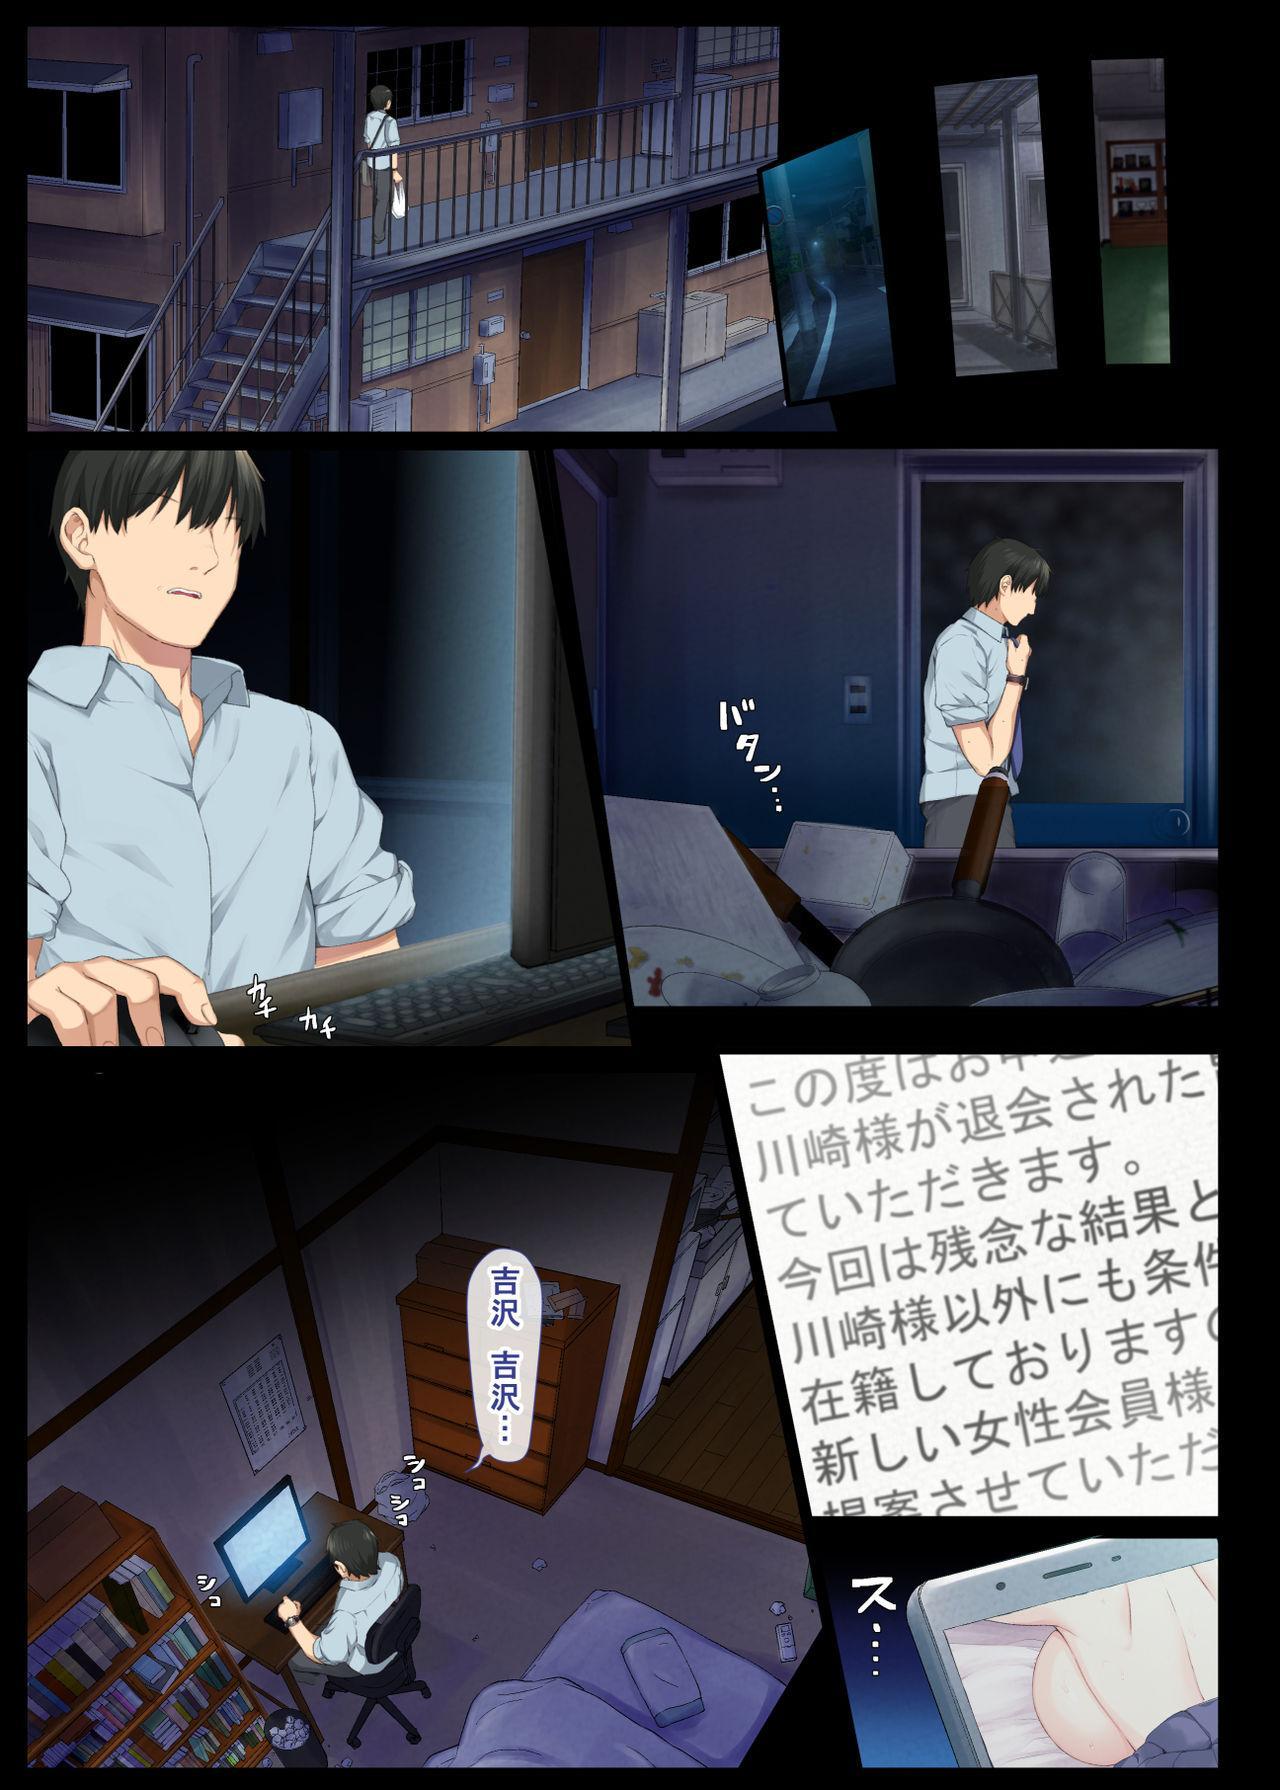 InCha Bishoujo wa, Tannin ni Okasarete mo Ikimakuru 34